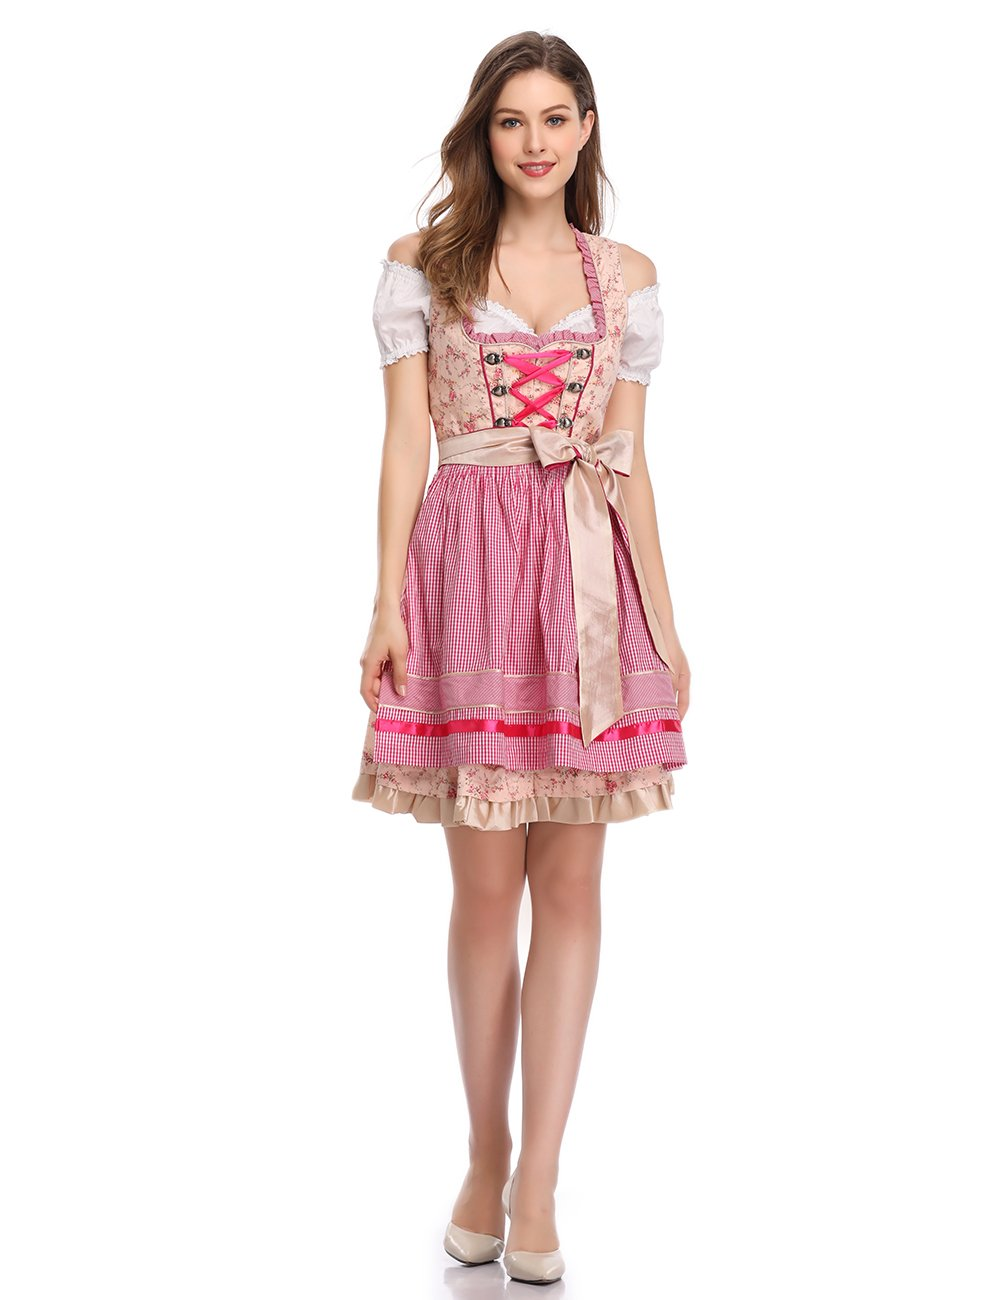 GloryStar Women's German Dirndl Dress Costumes for Bavarian Oktoberfest Carnival Halloween (M, Champagne Pink)